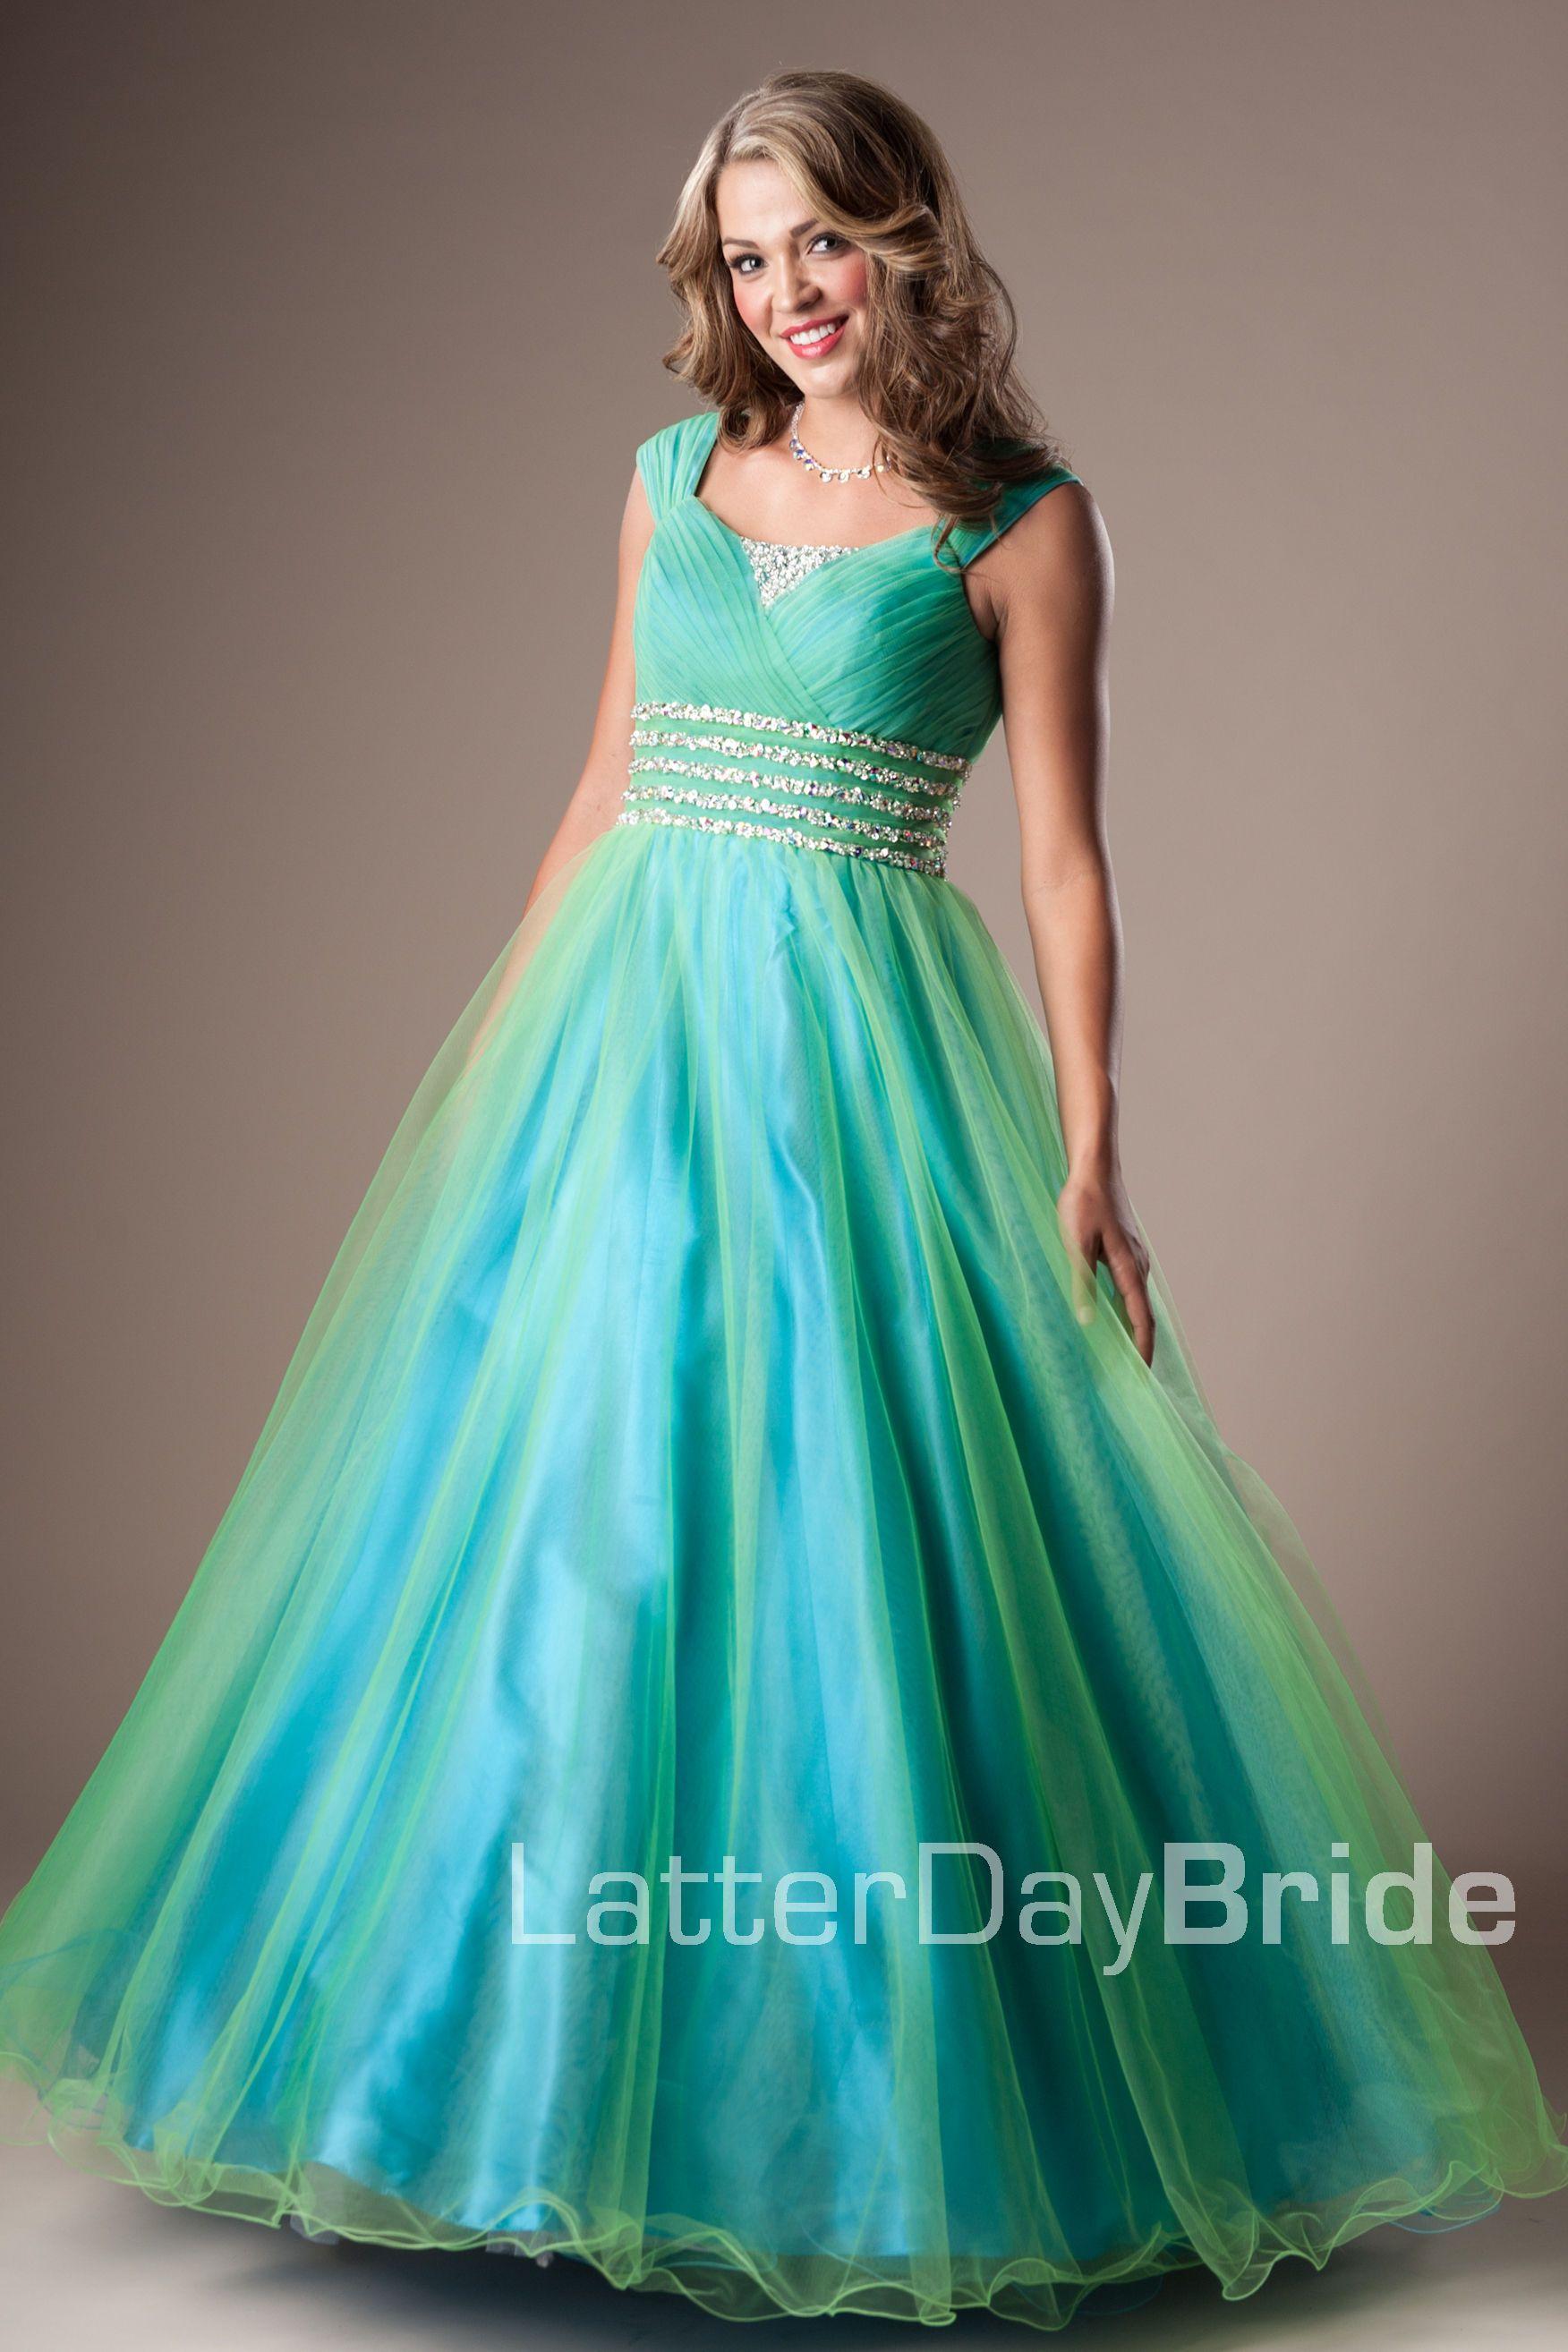 Bridesmaid & Prom, Ariel   LatterDayBride & Prom -Modest Mormon LDS ...